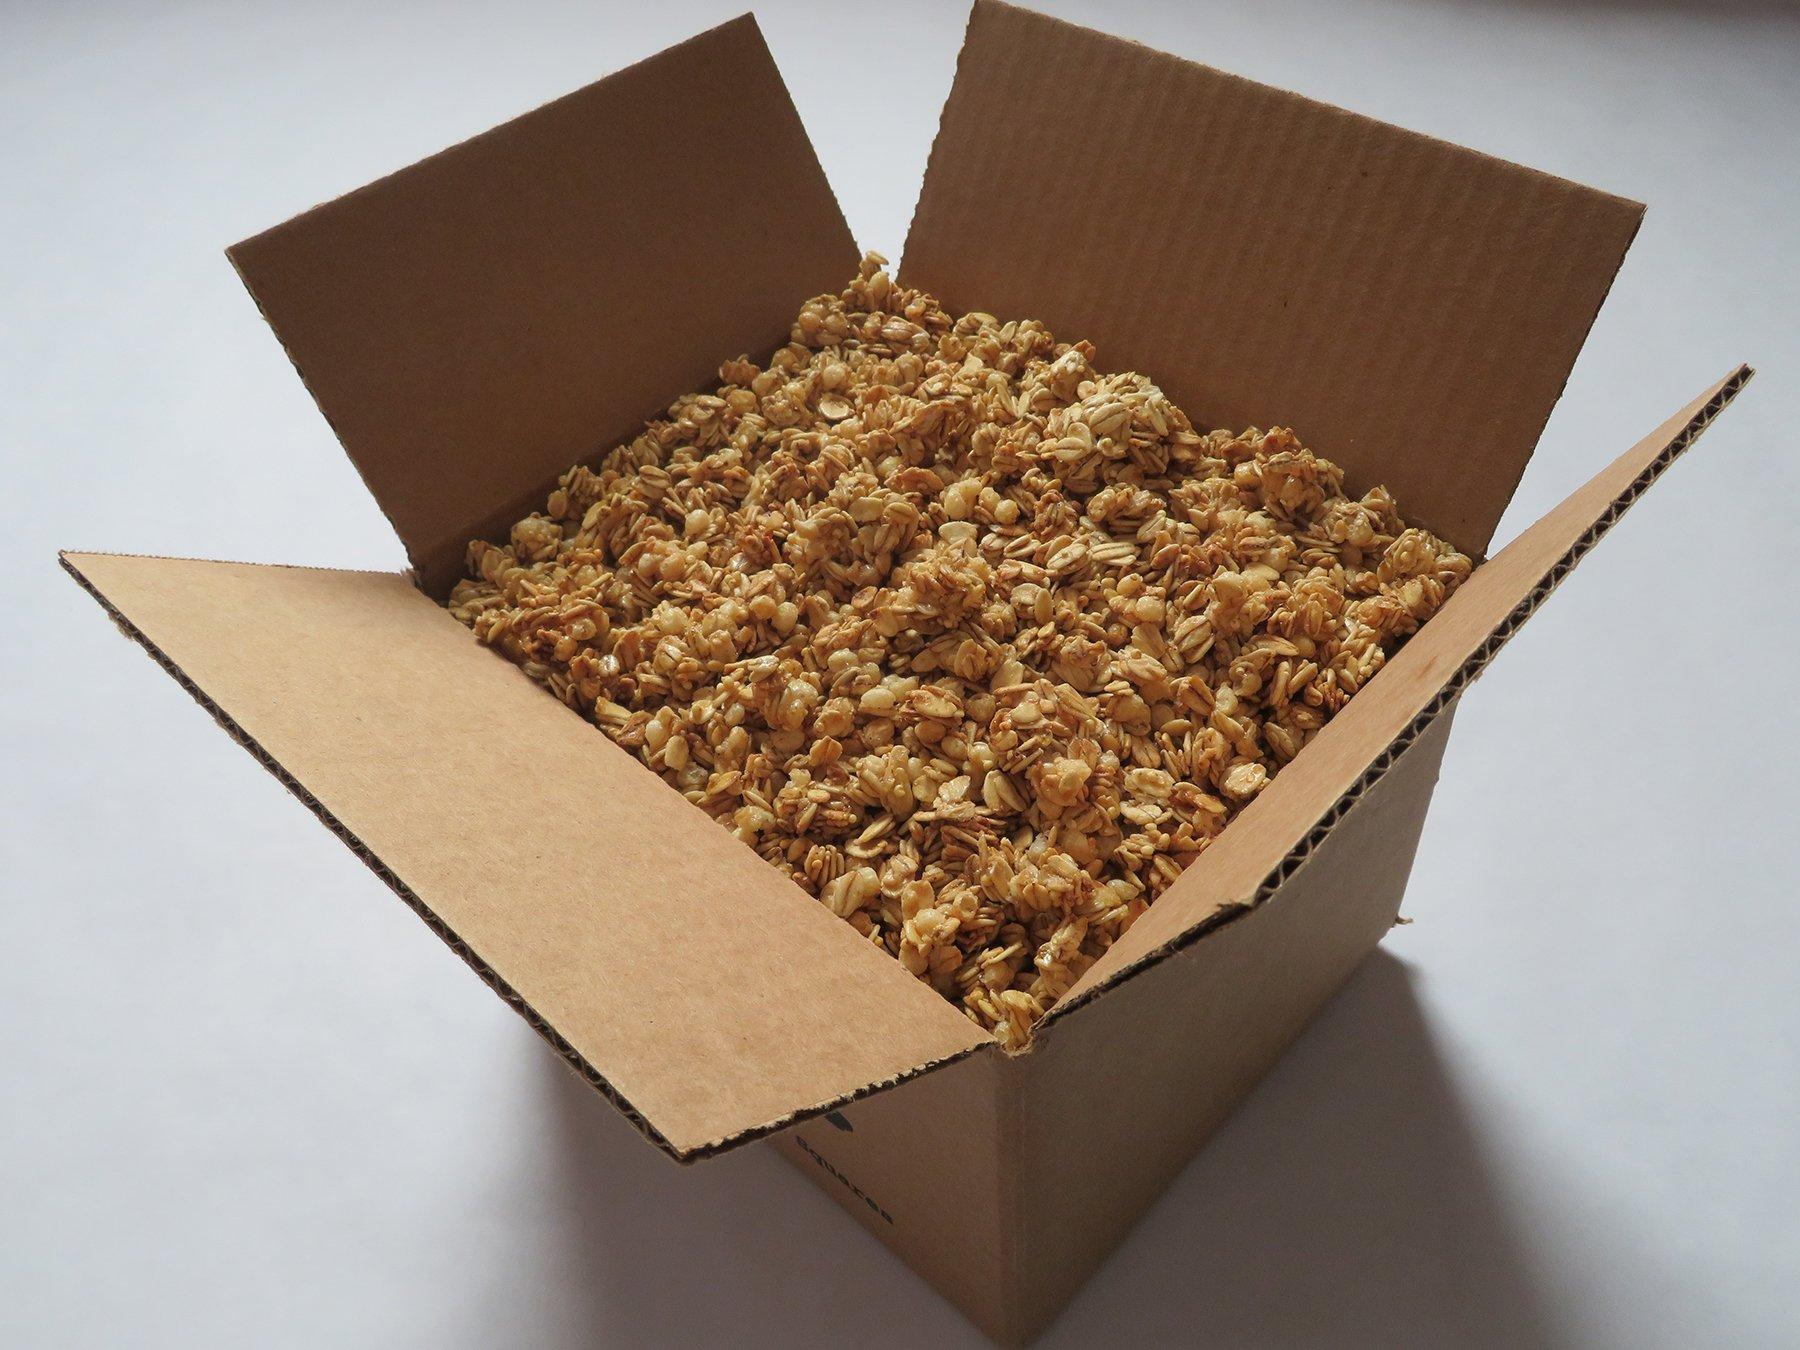 Bakery On Main Gluten Free Granola, Blueberry Flax, 22 Lb by Bakery On Main